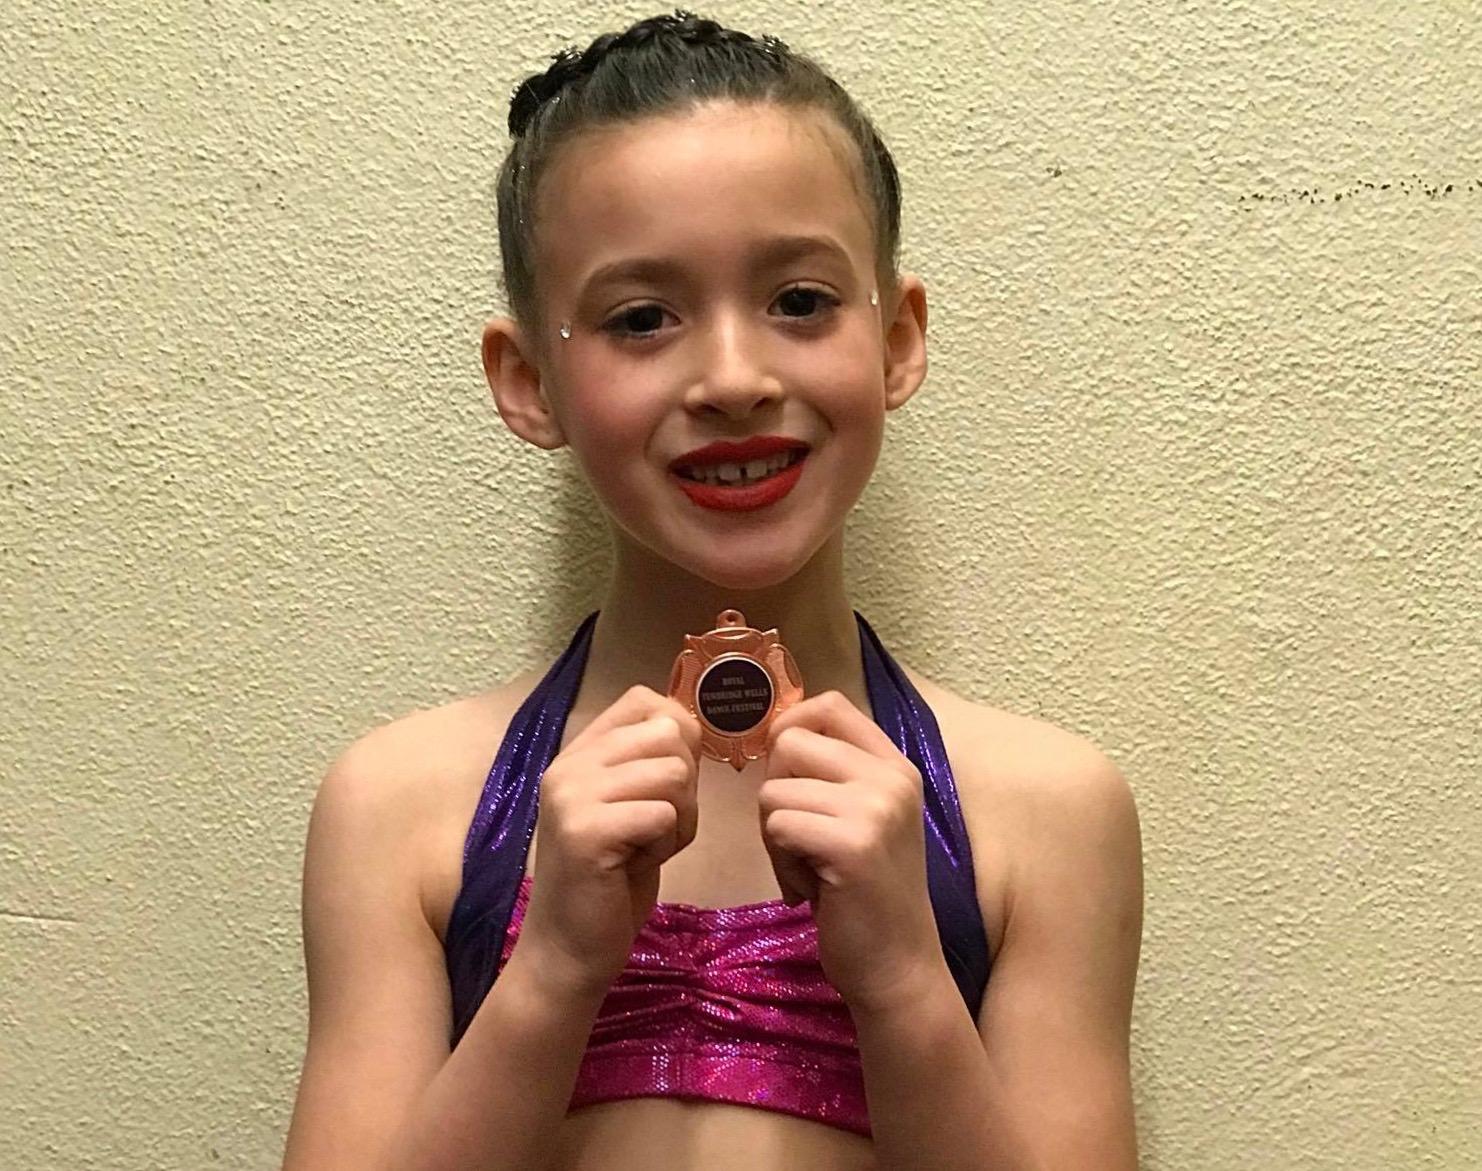 debs-dancers-mia-azerkane-87-marks-3rd-place-choreo-laura-farley-tunbridge-wells (1)